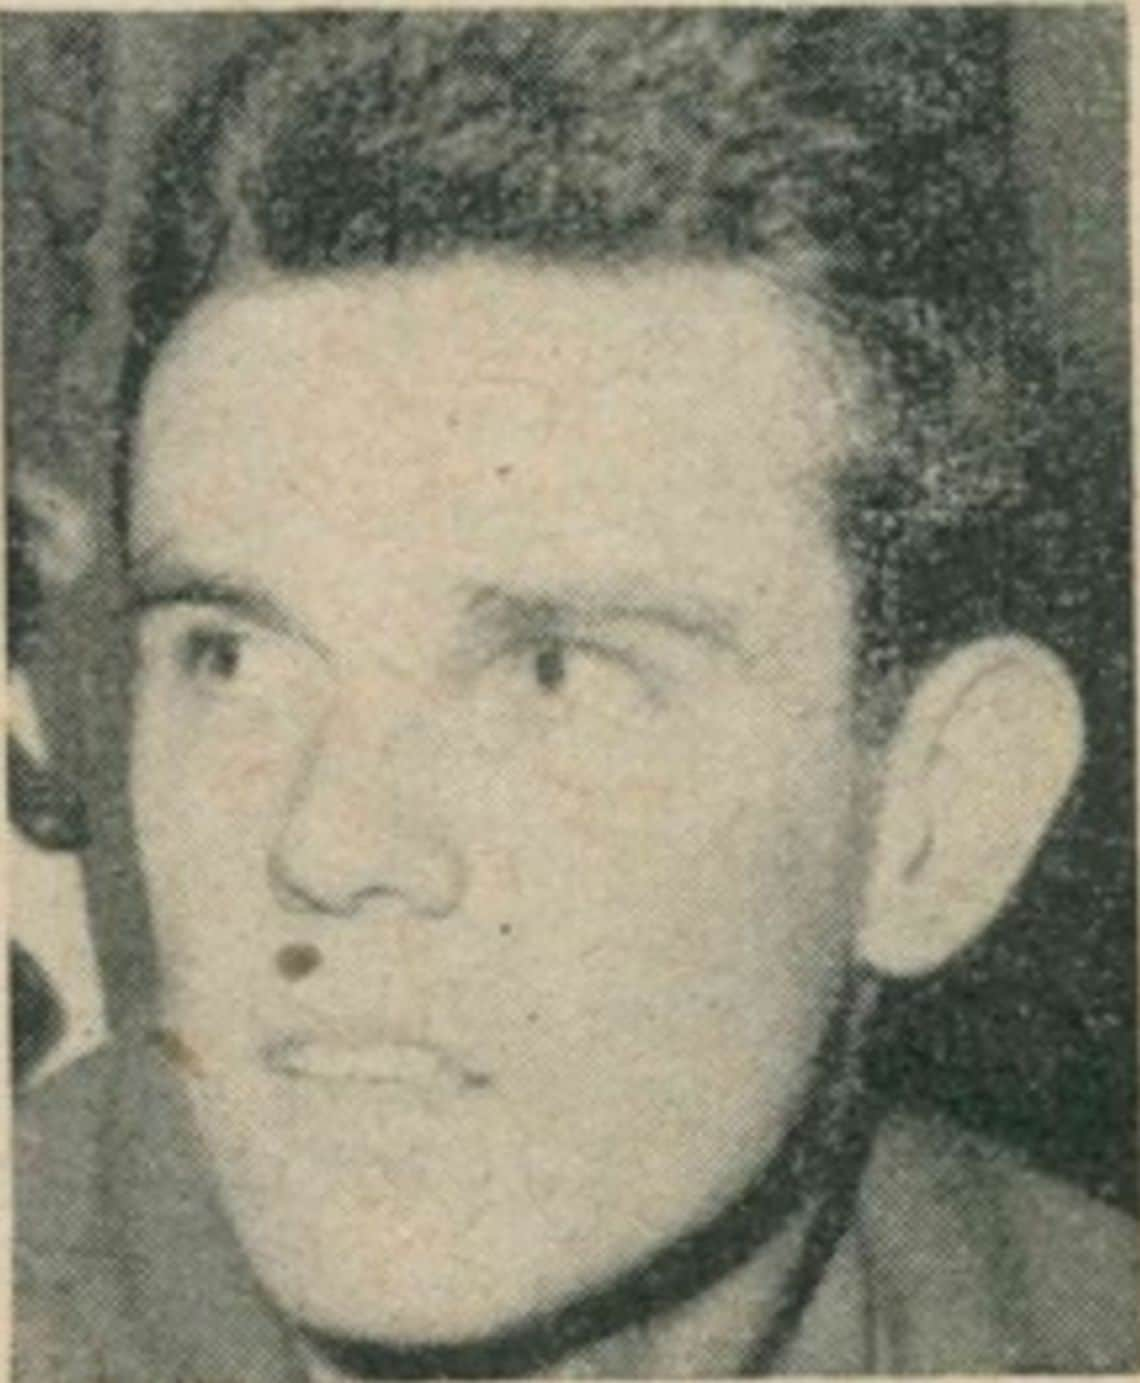 Lothar Fährmann